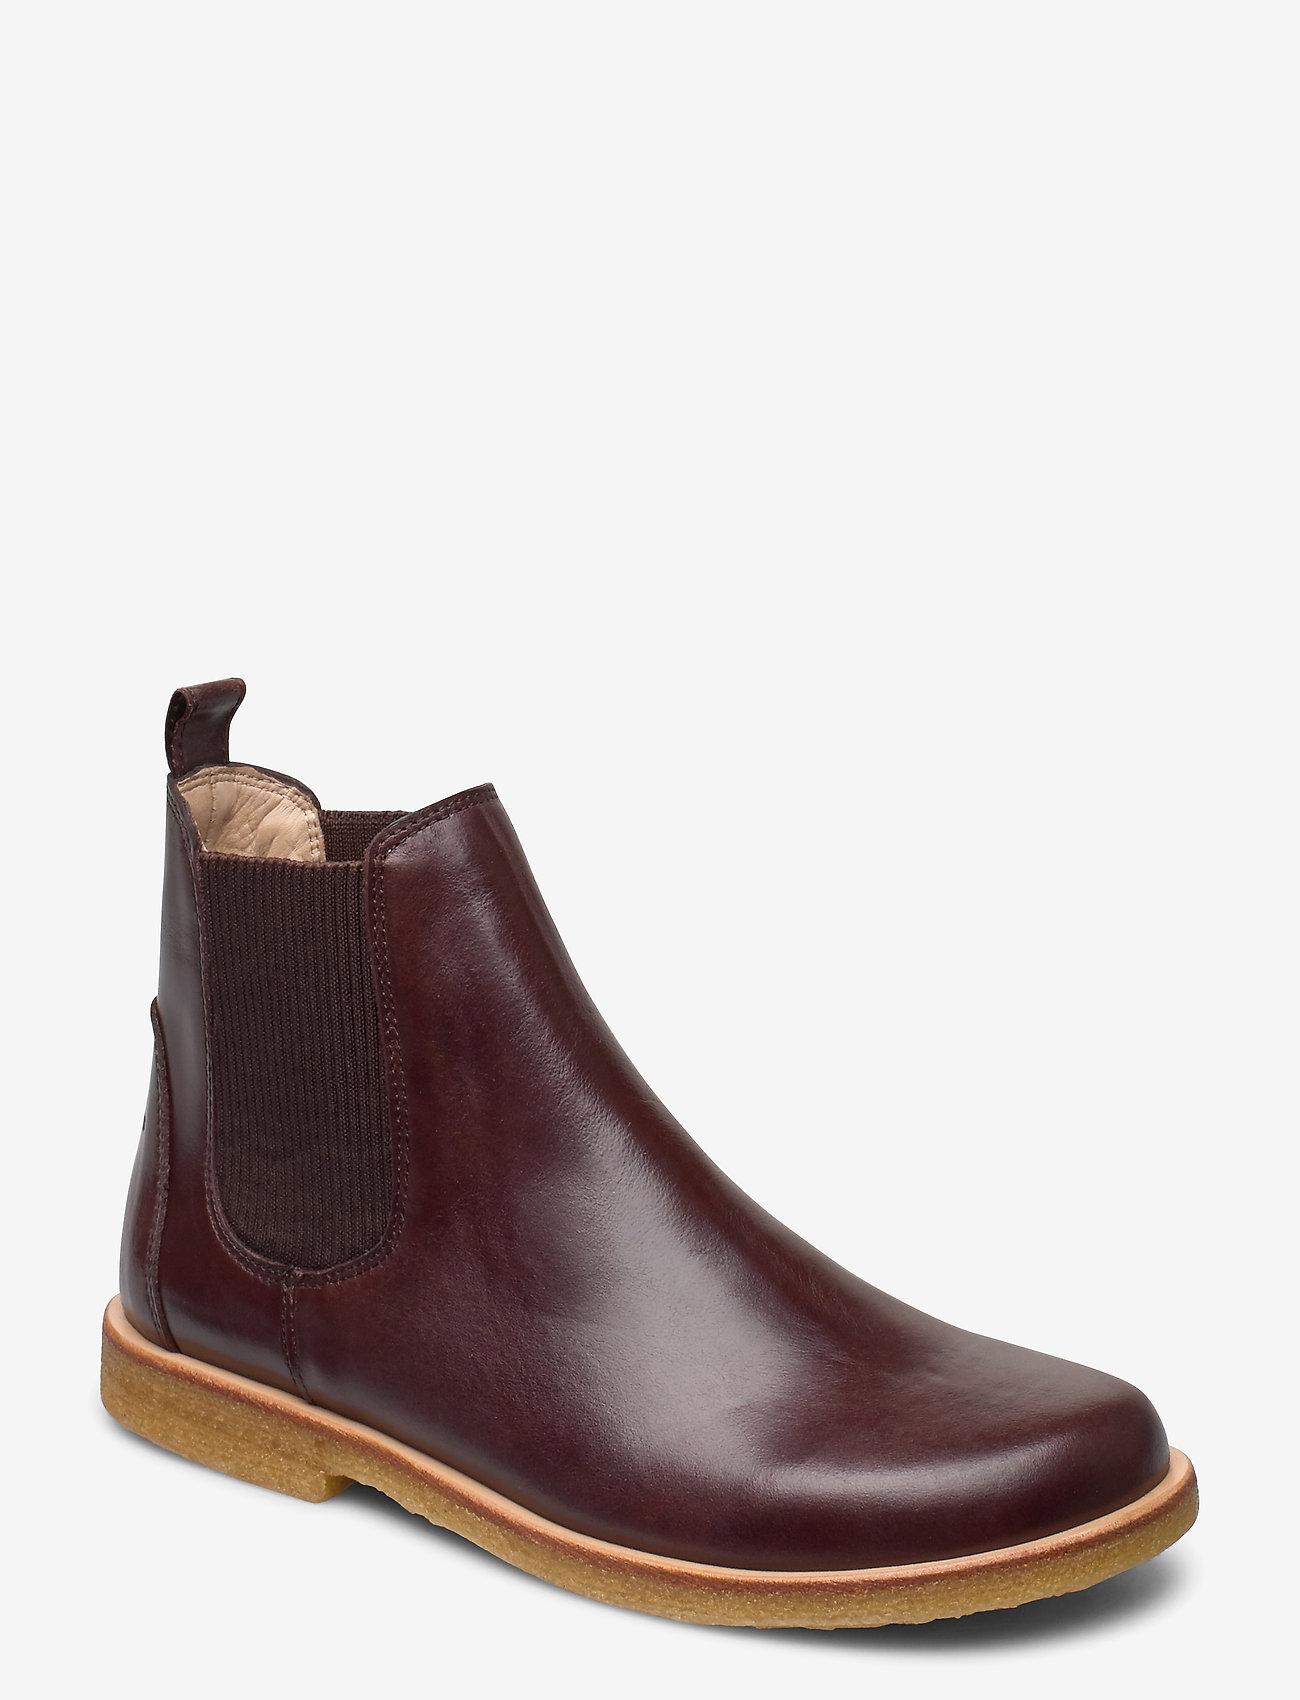 ANGULUS - Booties-flat - with elastic - chelsea boots - 1836/046 dark brown/d. brown - 0